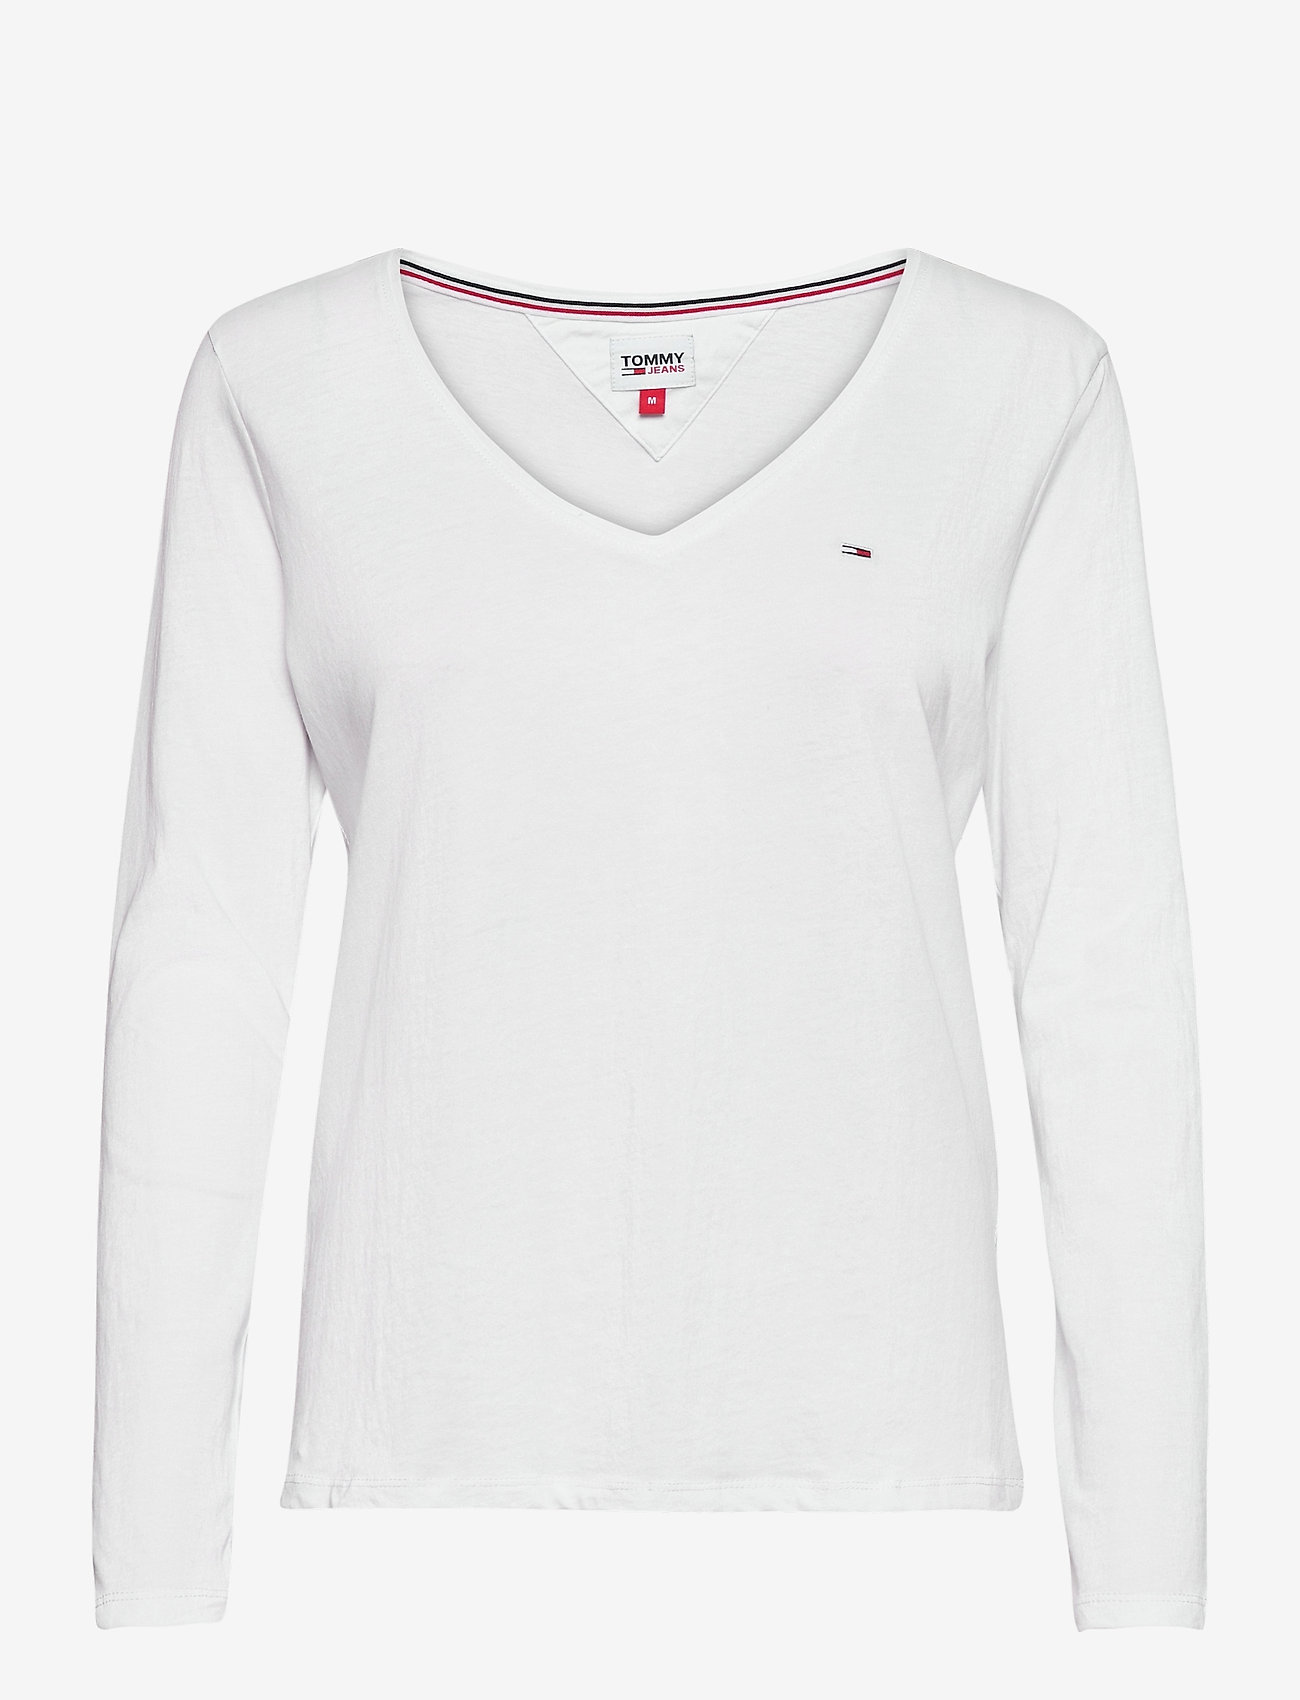 Tommy Jeans - TJW JERSEY V NECK LONGSLEEVE - long-sleeved tops - white - 0